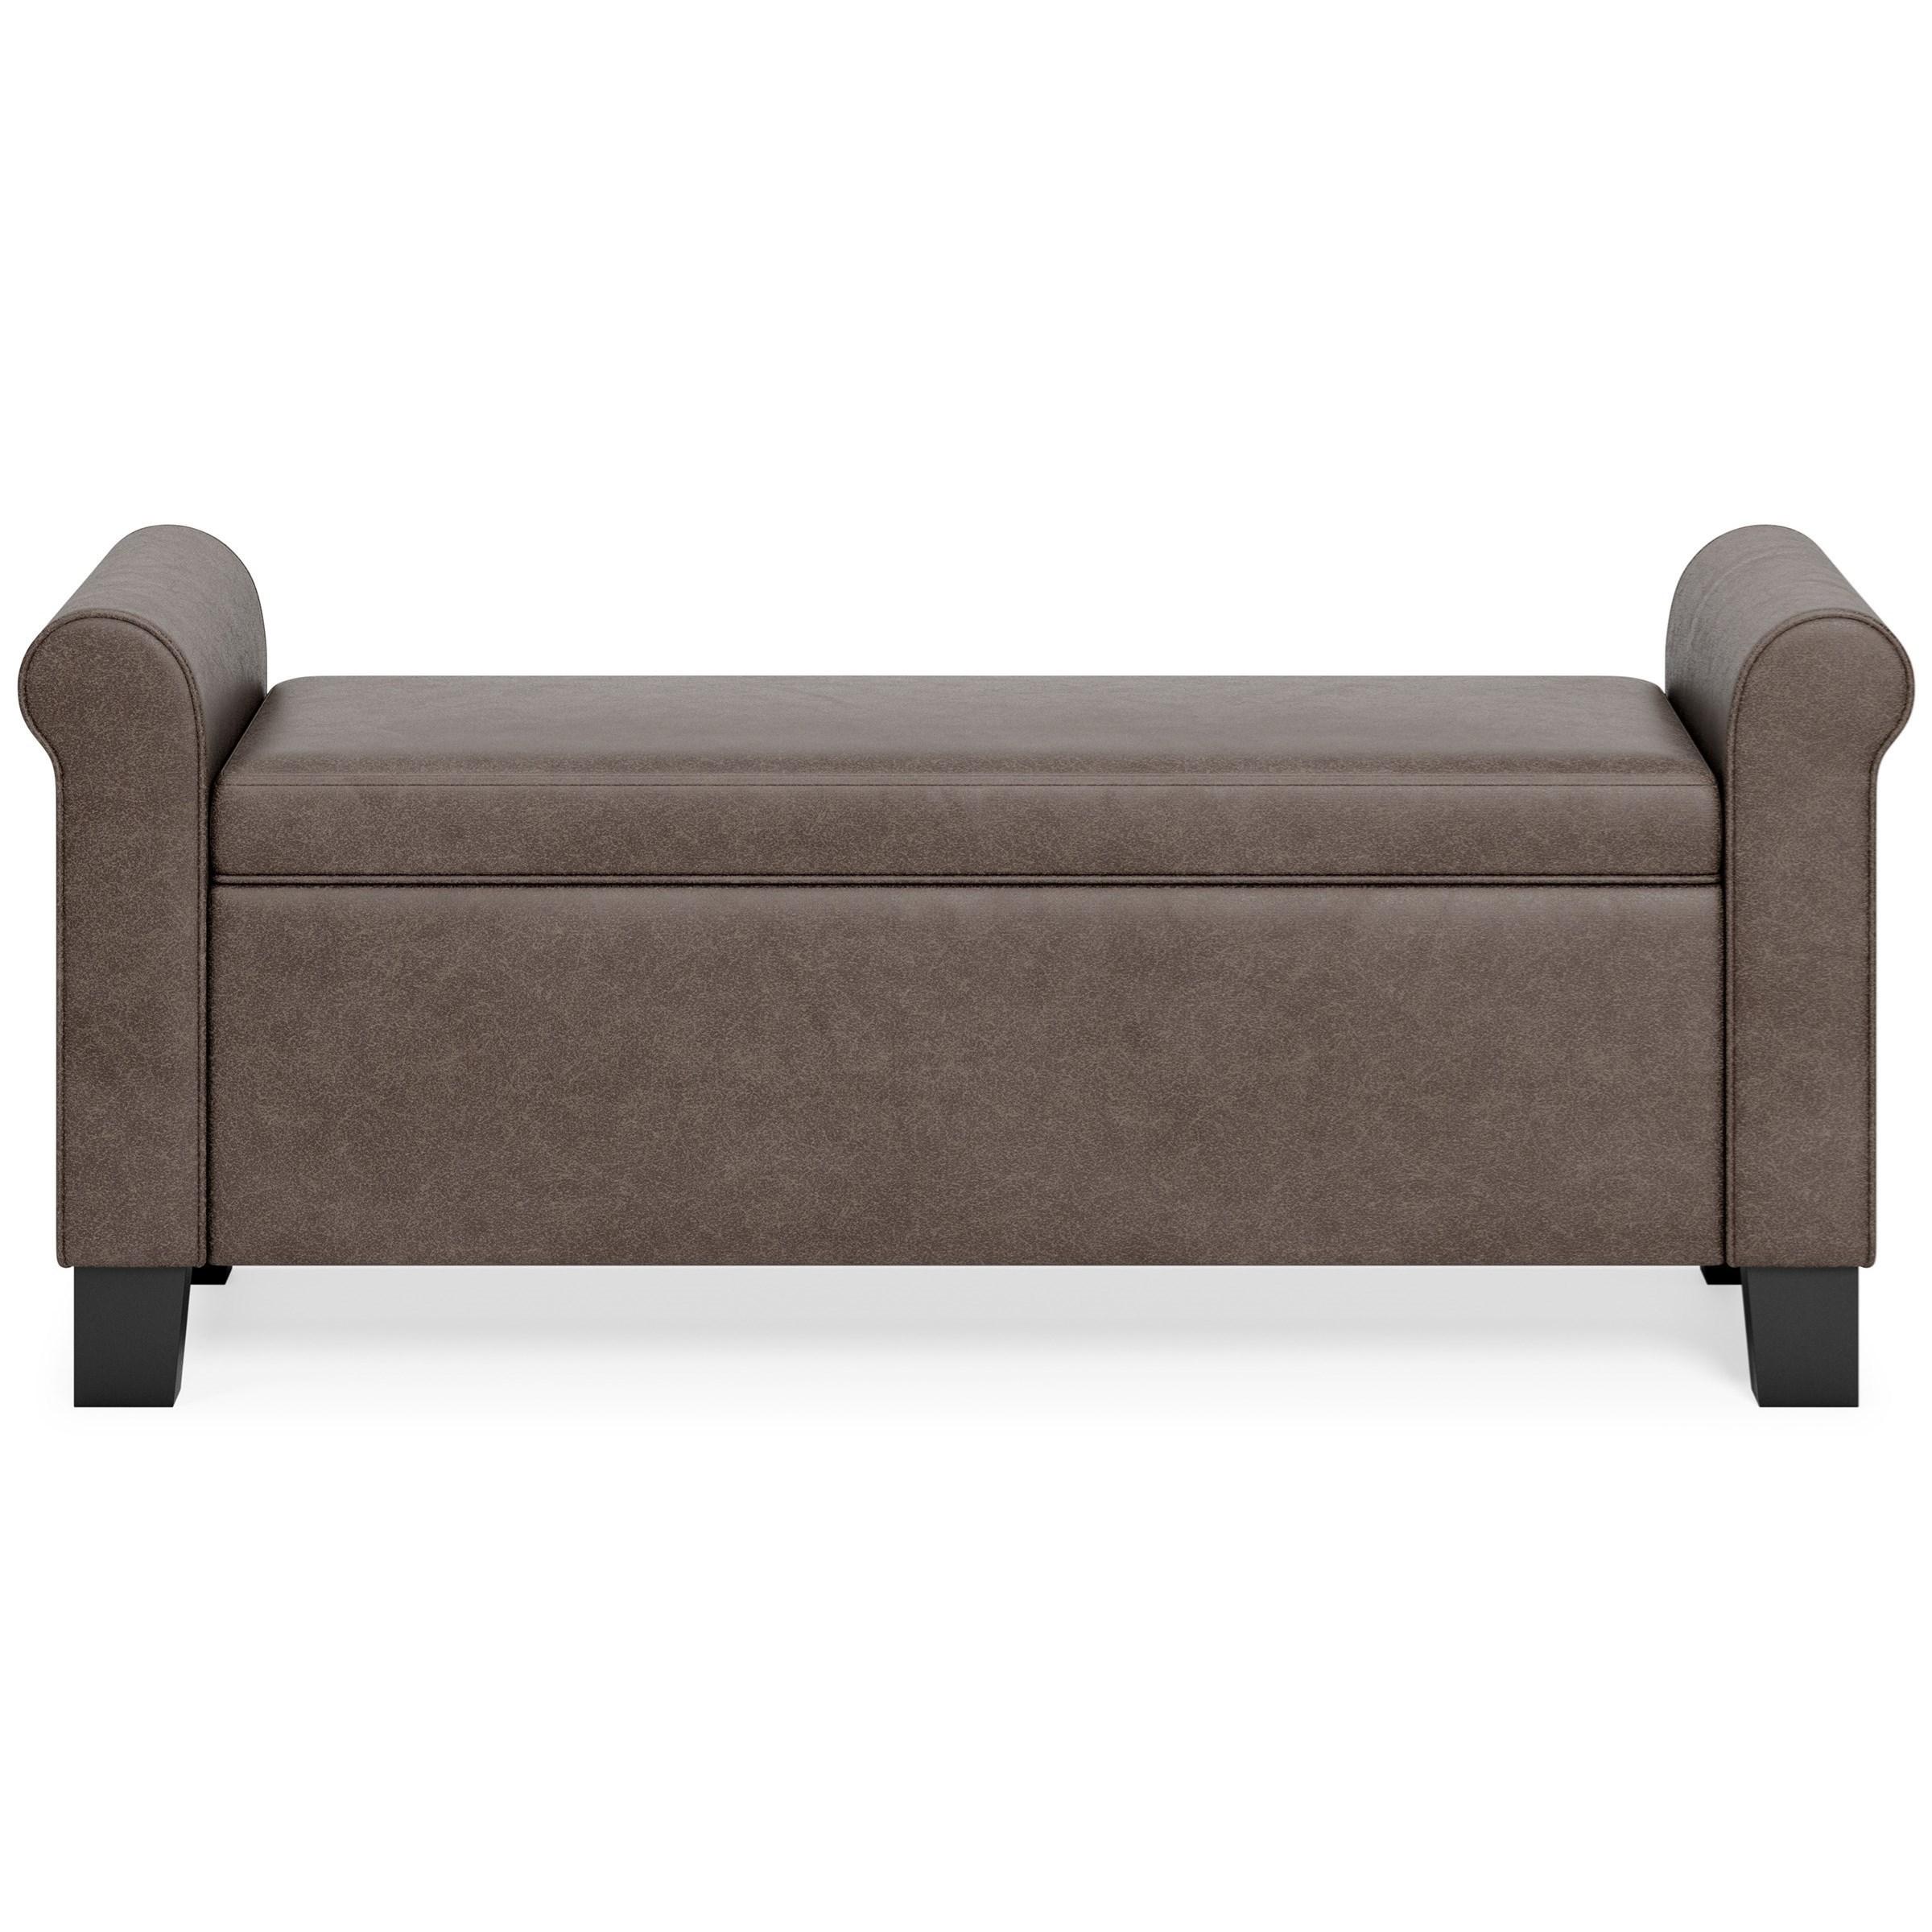 Durbinleigh Storage Bench by Signature Design by Ashley at Furniture Fair - North Carolina